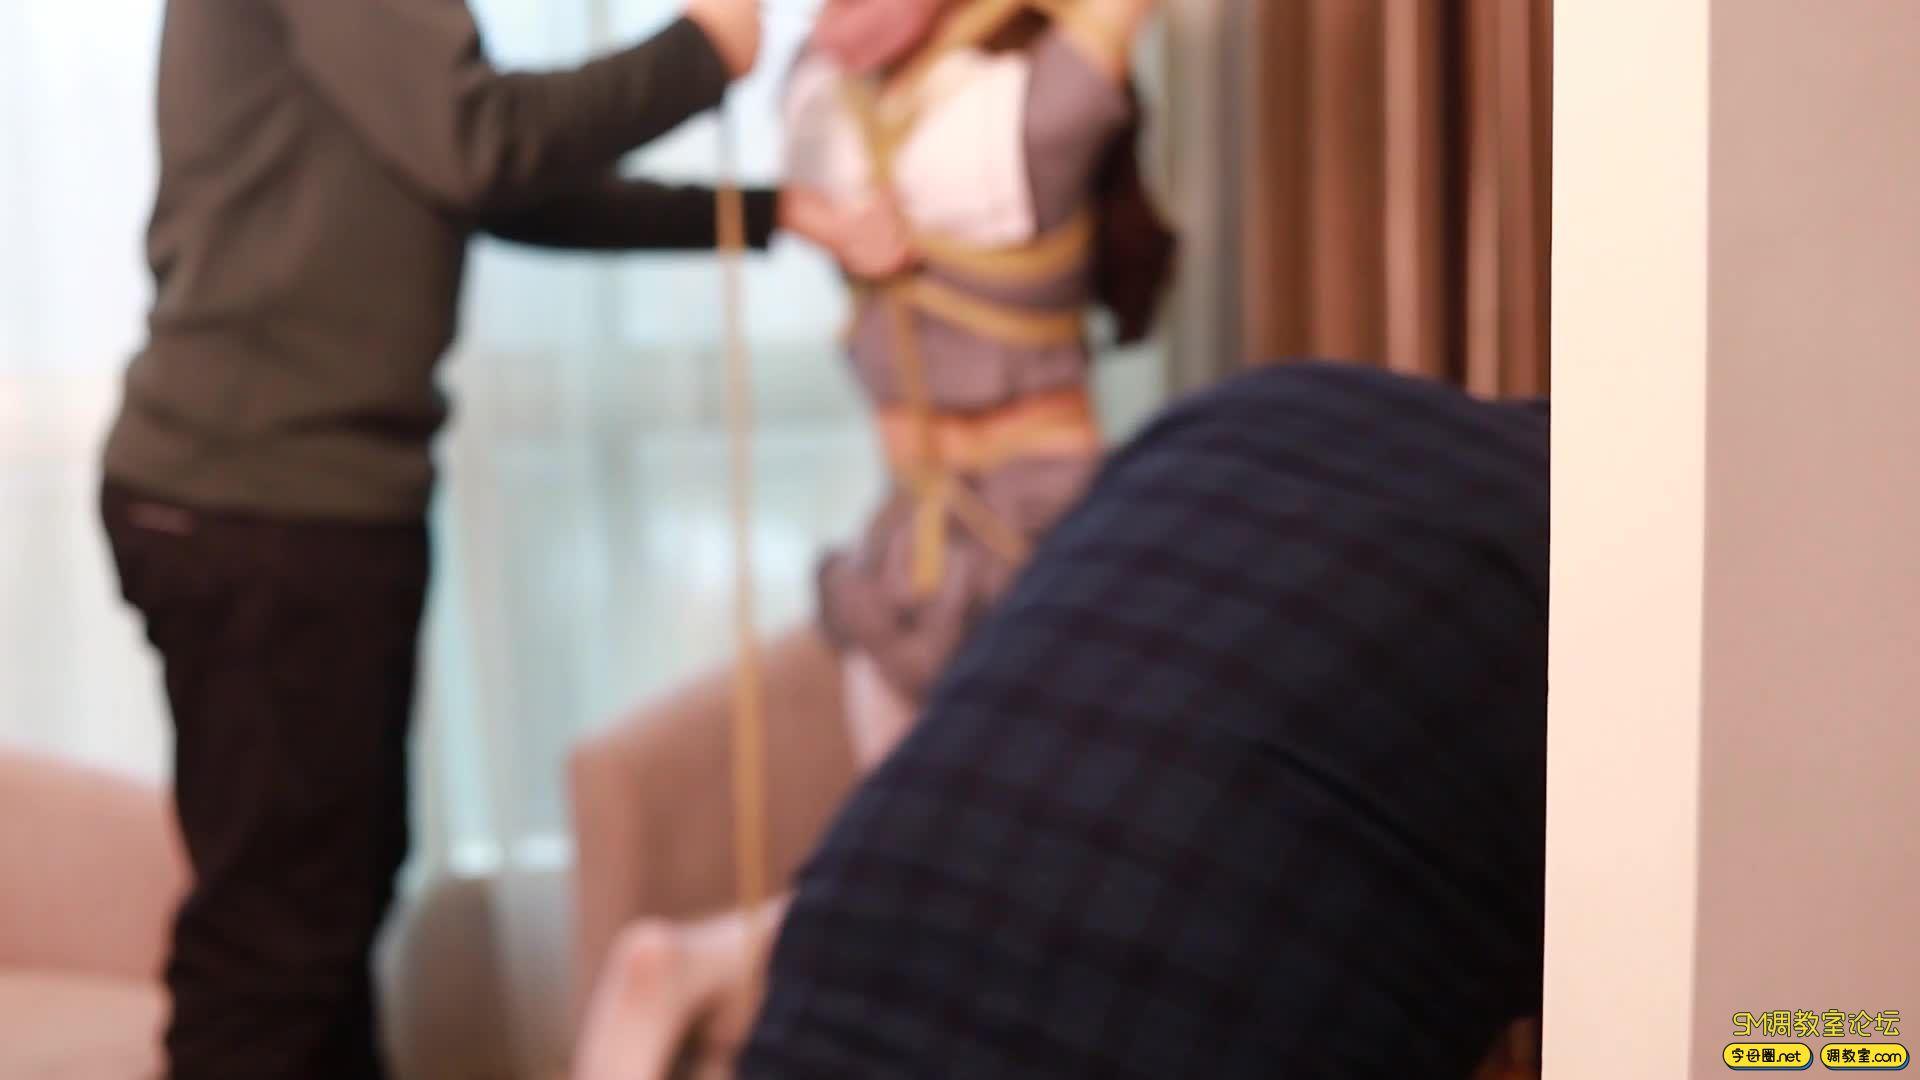 GC原创_梓微的双马尾萝莉捆绑TK-视频截图6